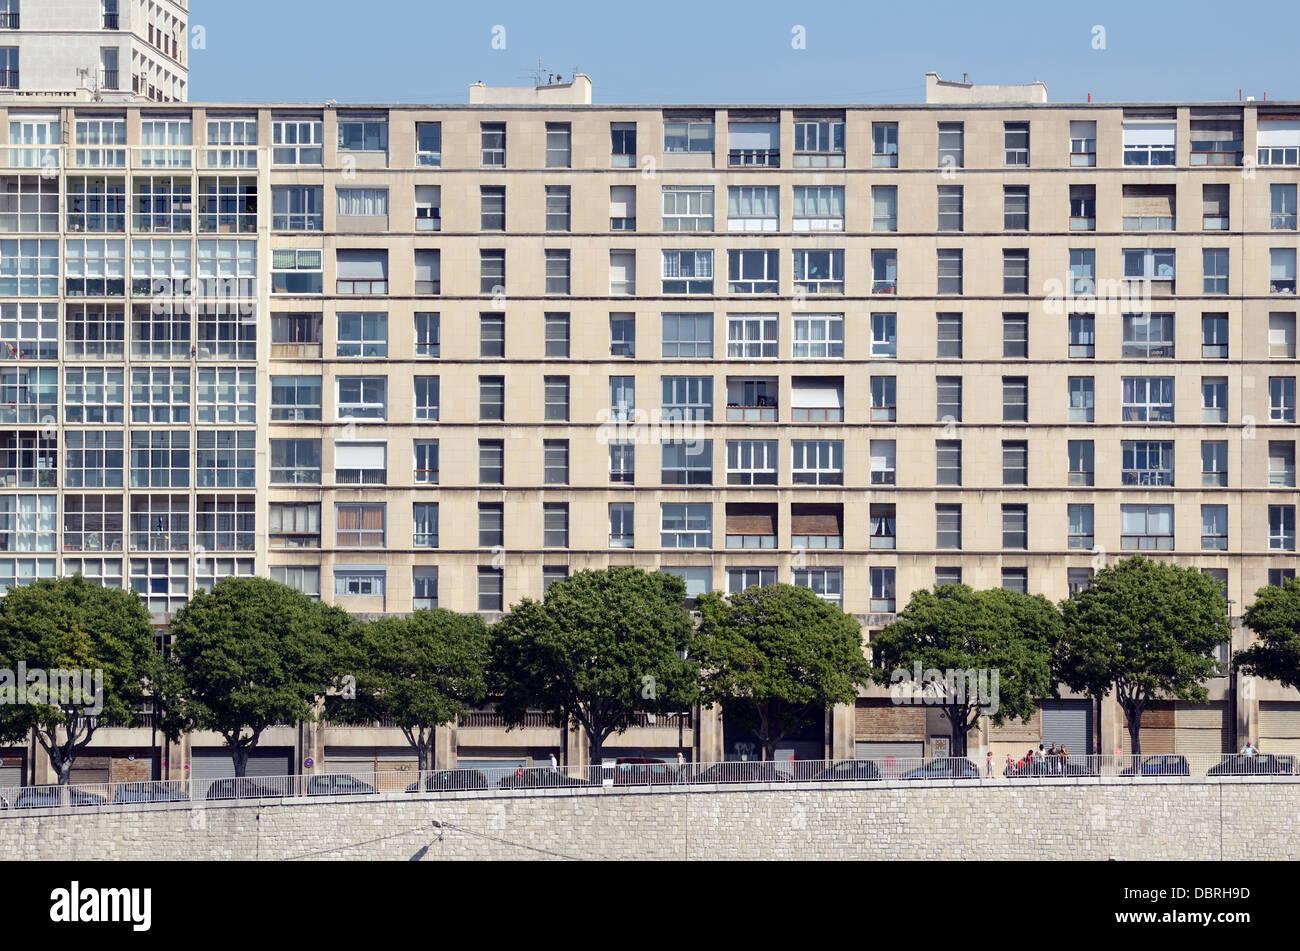 La Tourette Public Sector or Council Housing Estate on the Waterfront Marseille France - Stock Image